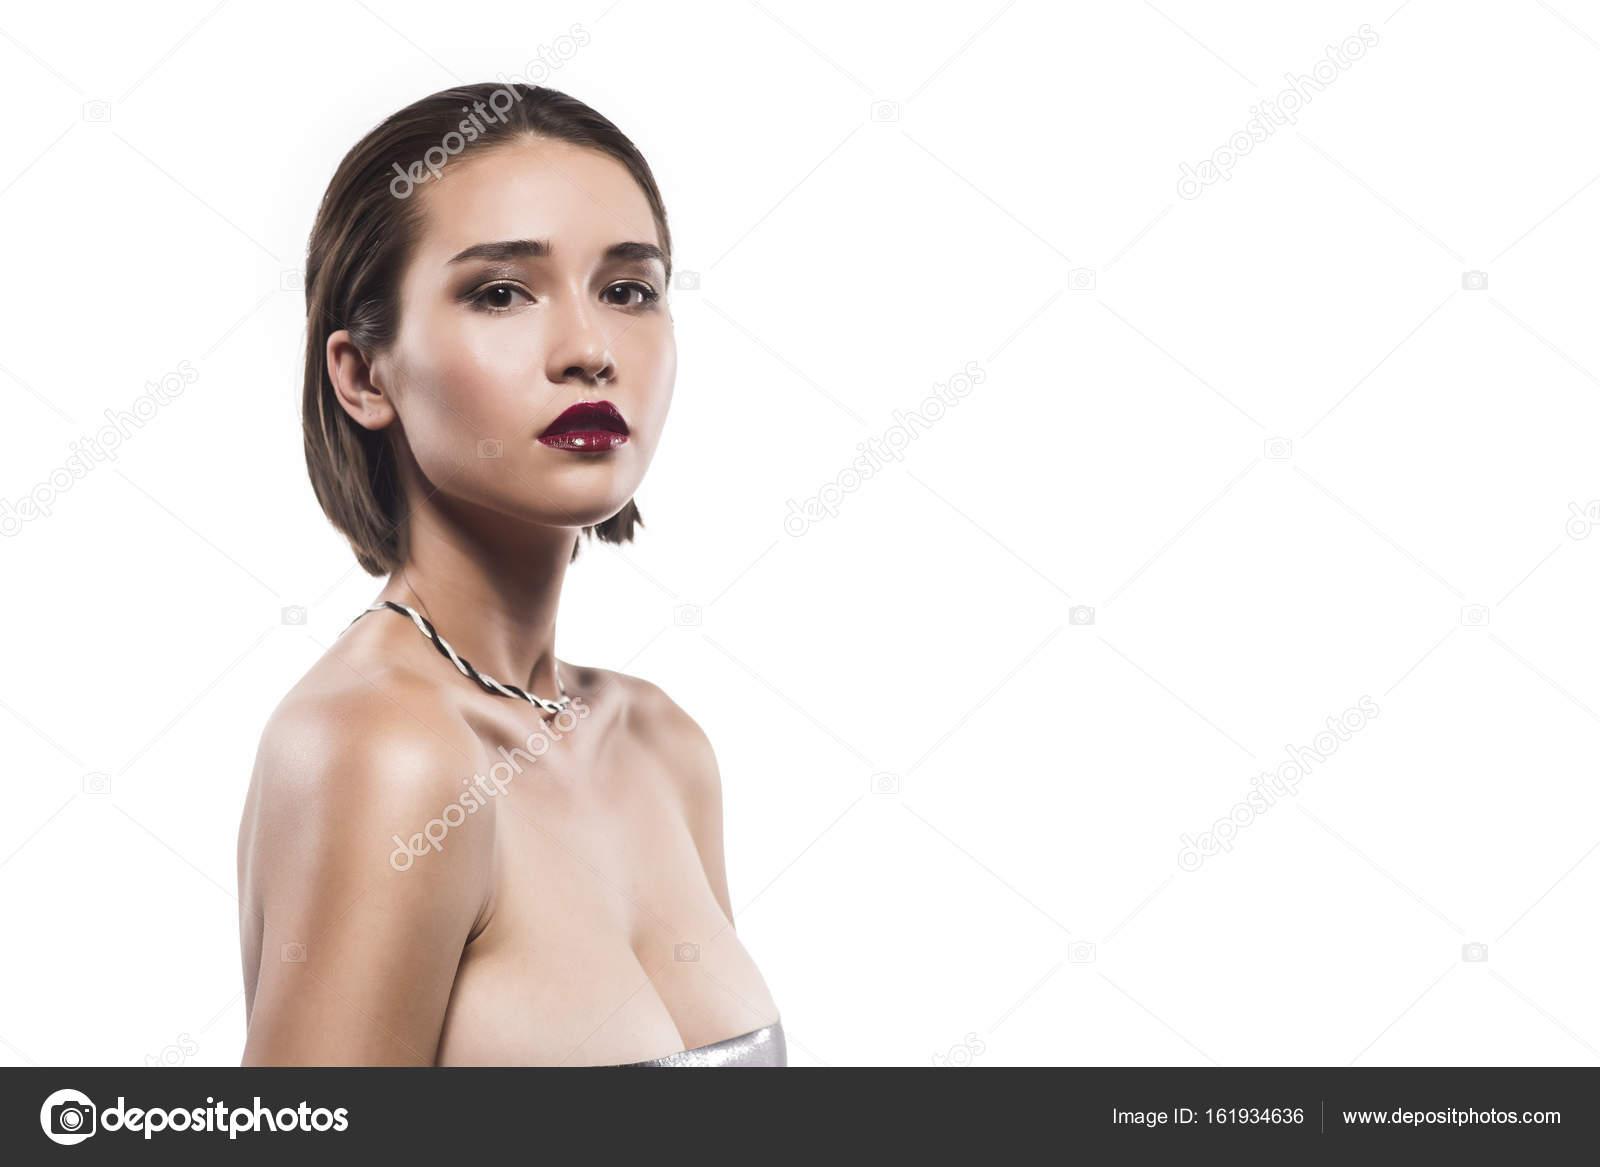 mladé dámy nahé fotky